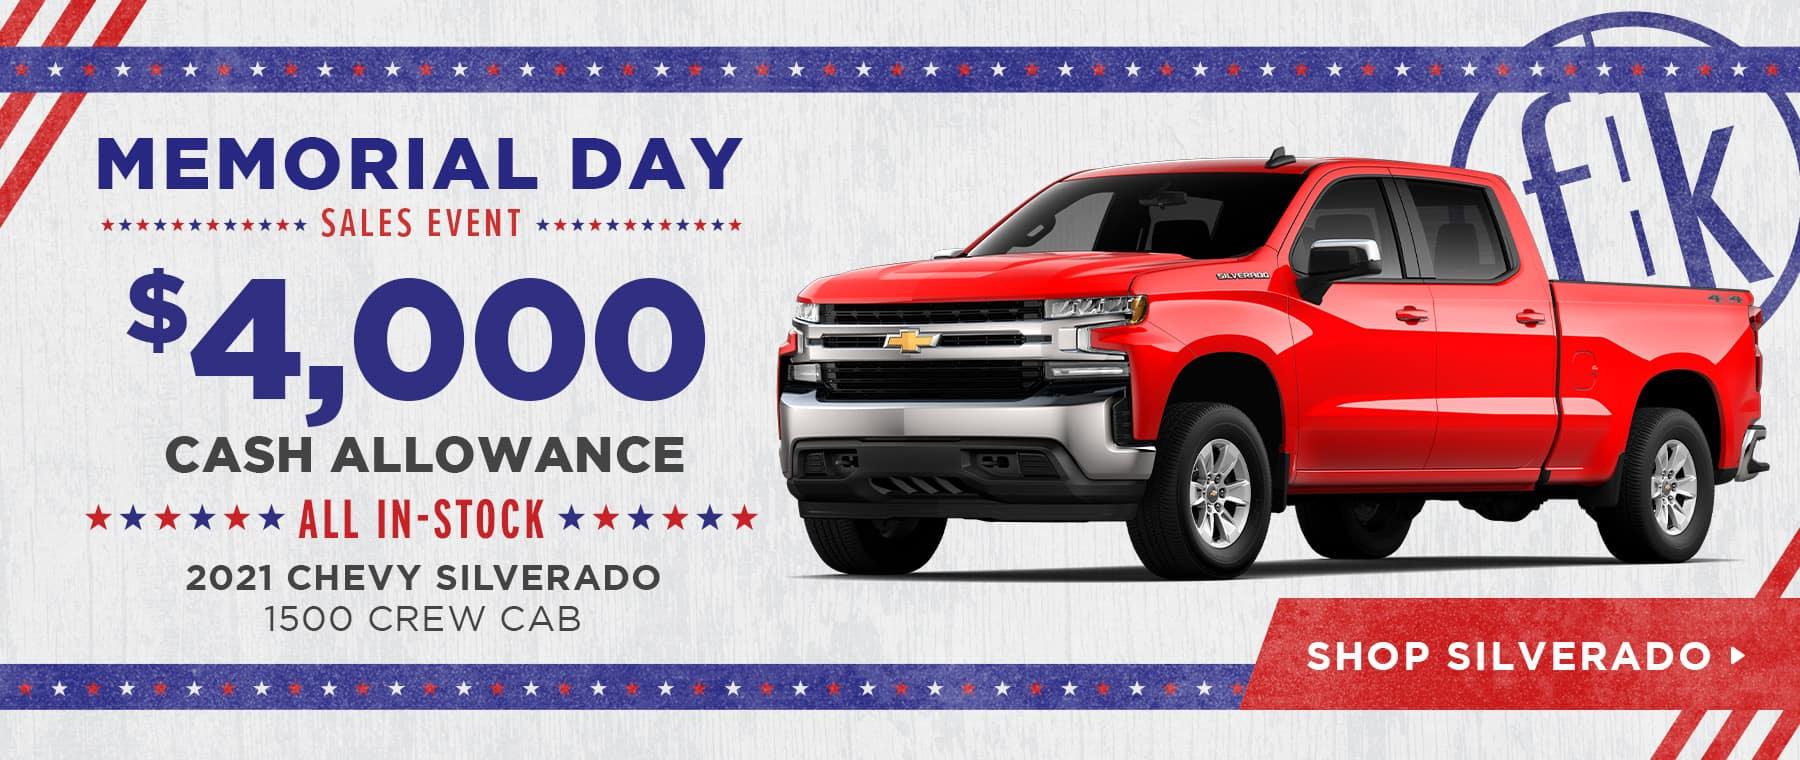 $4,000 Cash Allowance All In-Stock 2021 Chevy Silverado 1500 Crew Cab